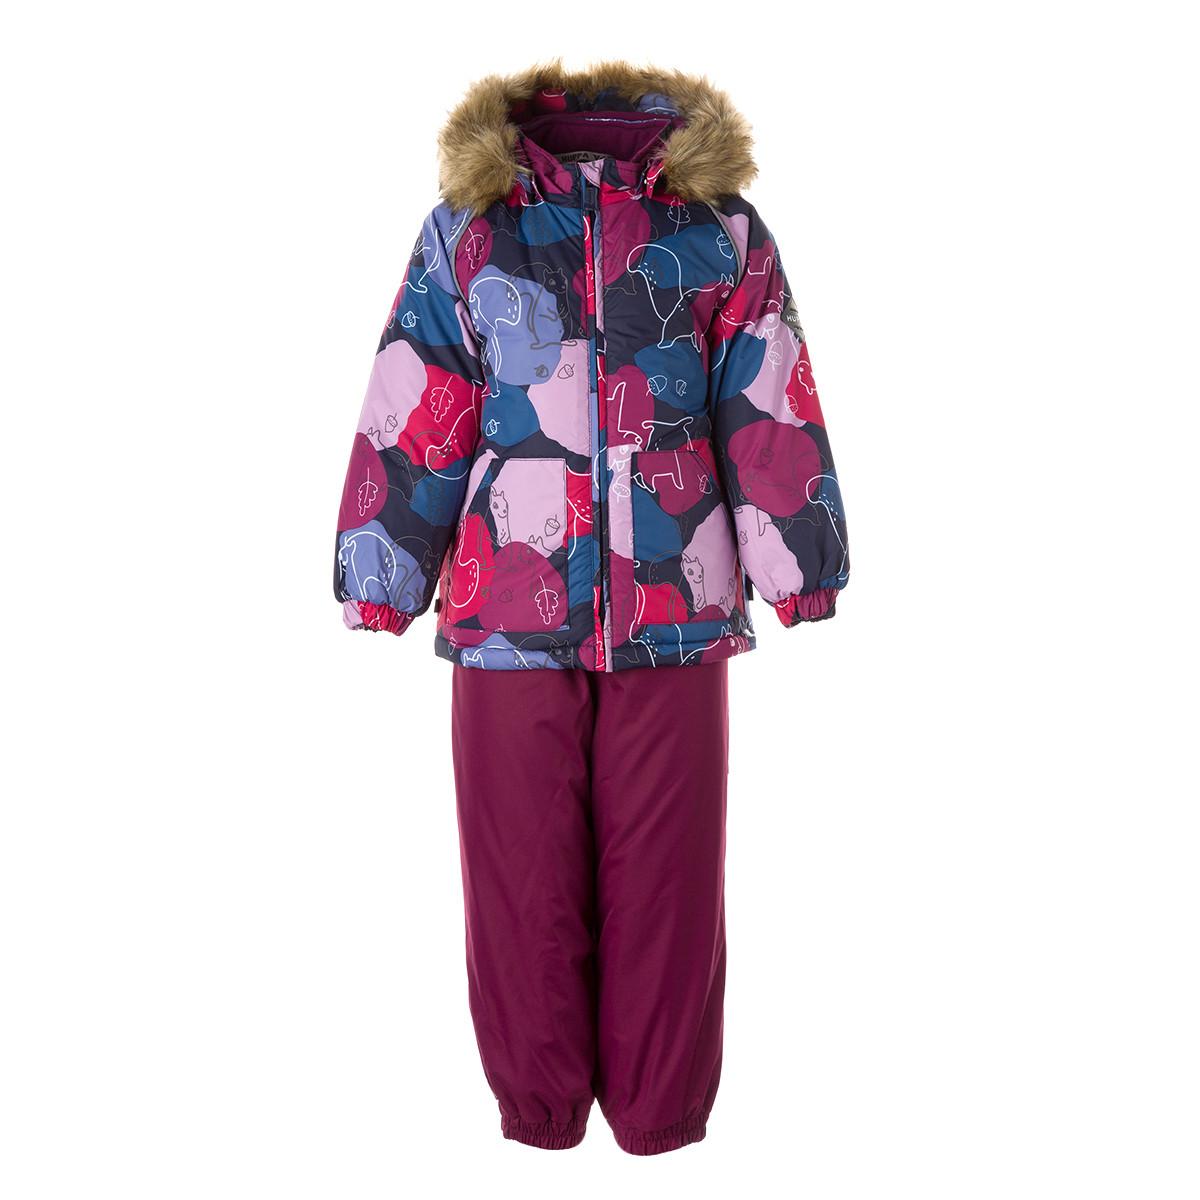 Детский комплект Huppa AVERY, пурпур с принтом/бордовый